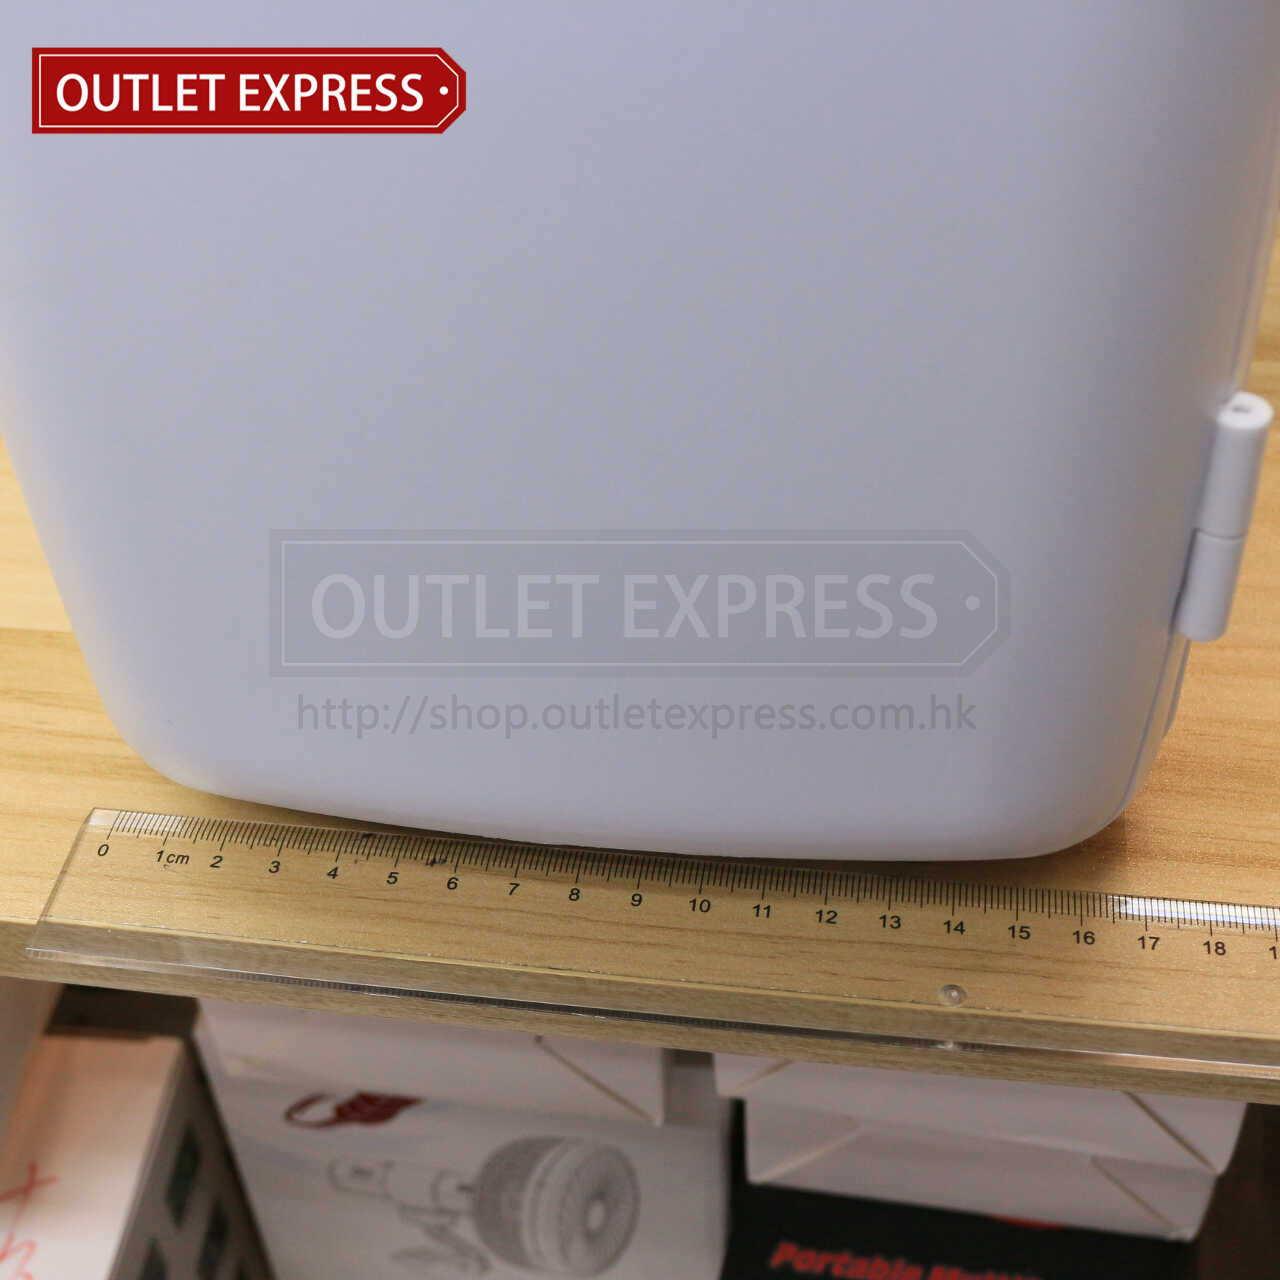 4L 冷暖兩用迷你小雪櫃 | 可車載或家用 寬度- Outlet Express HK生活百貨城實拍相片